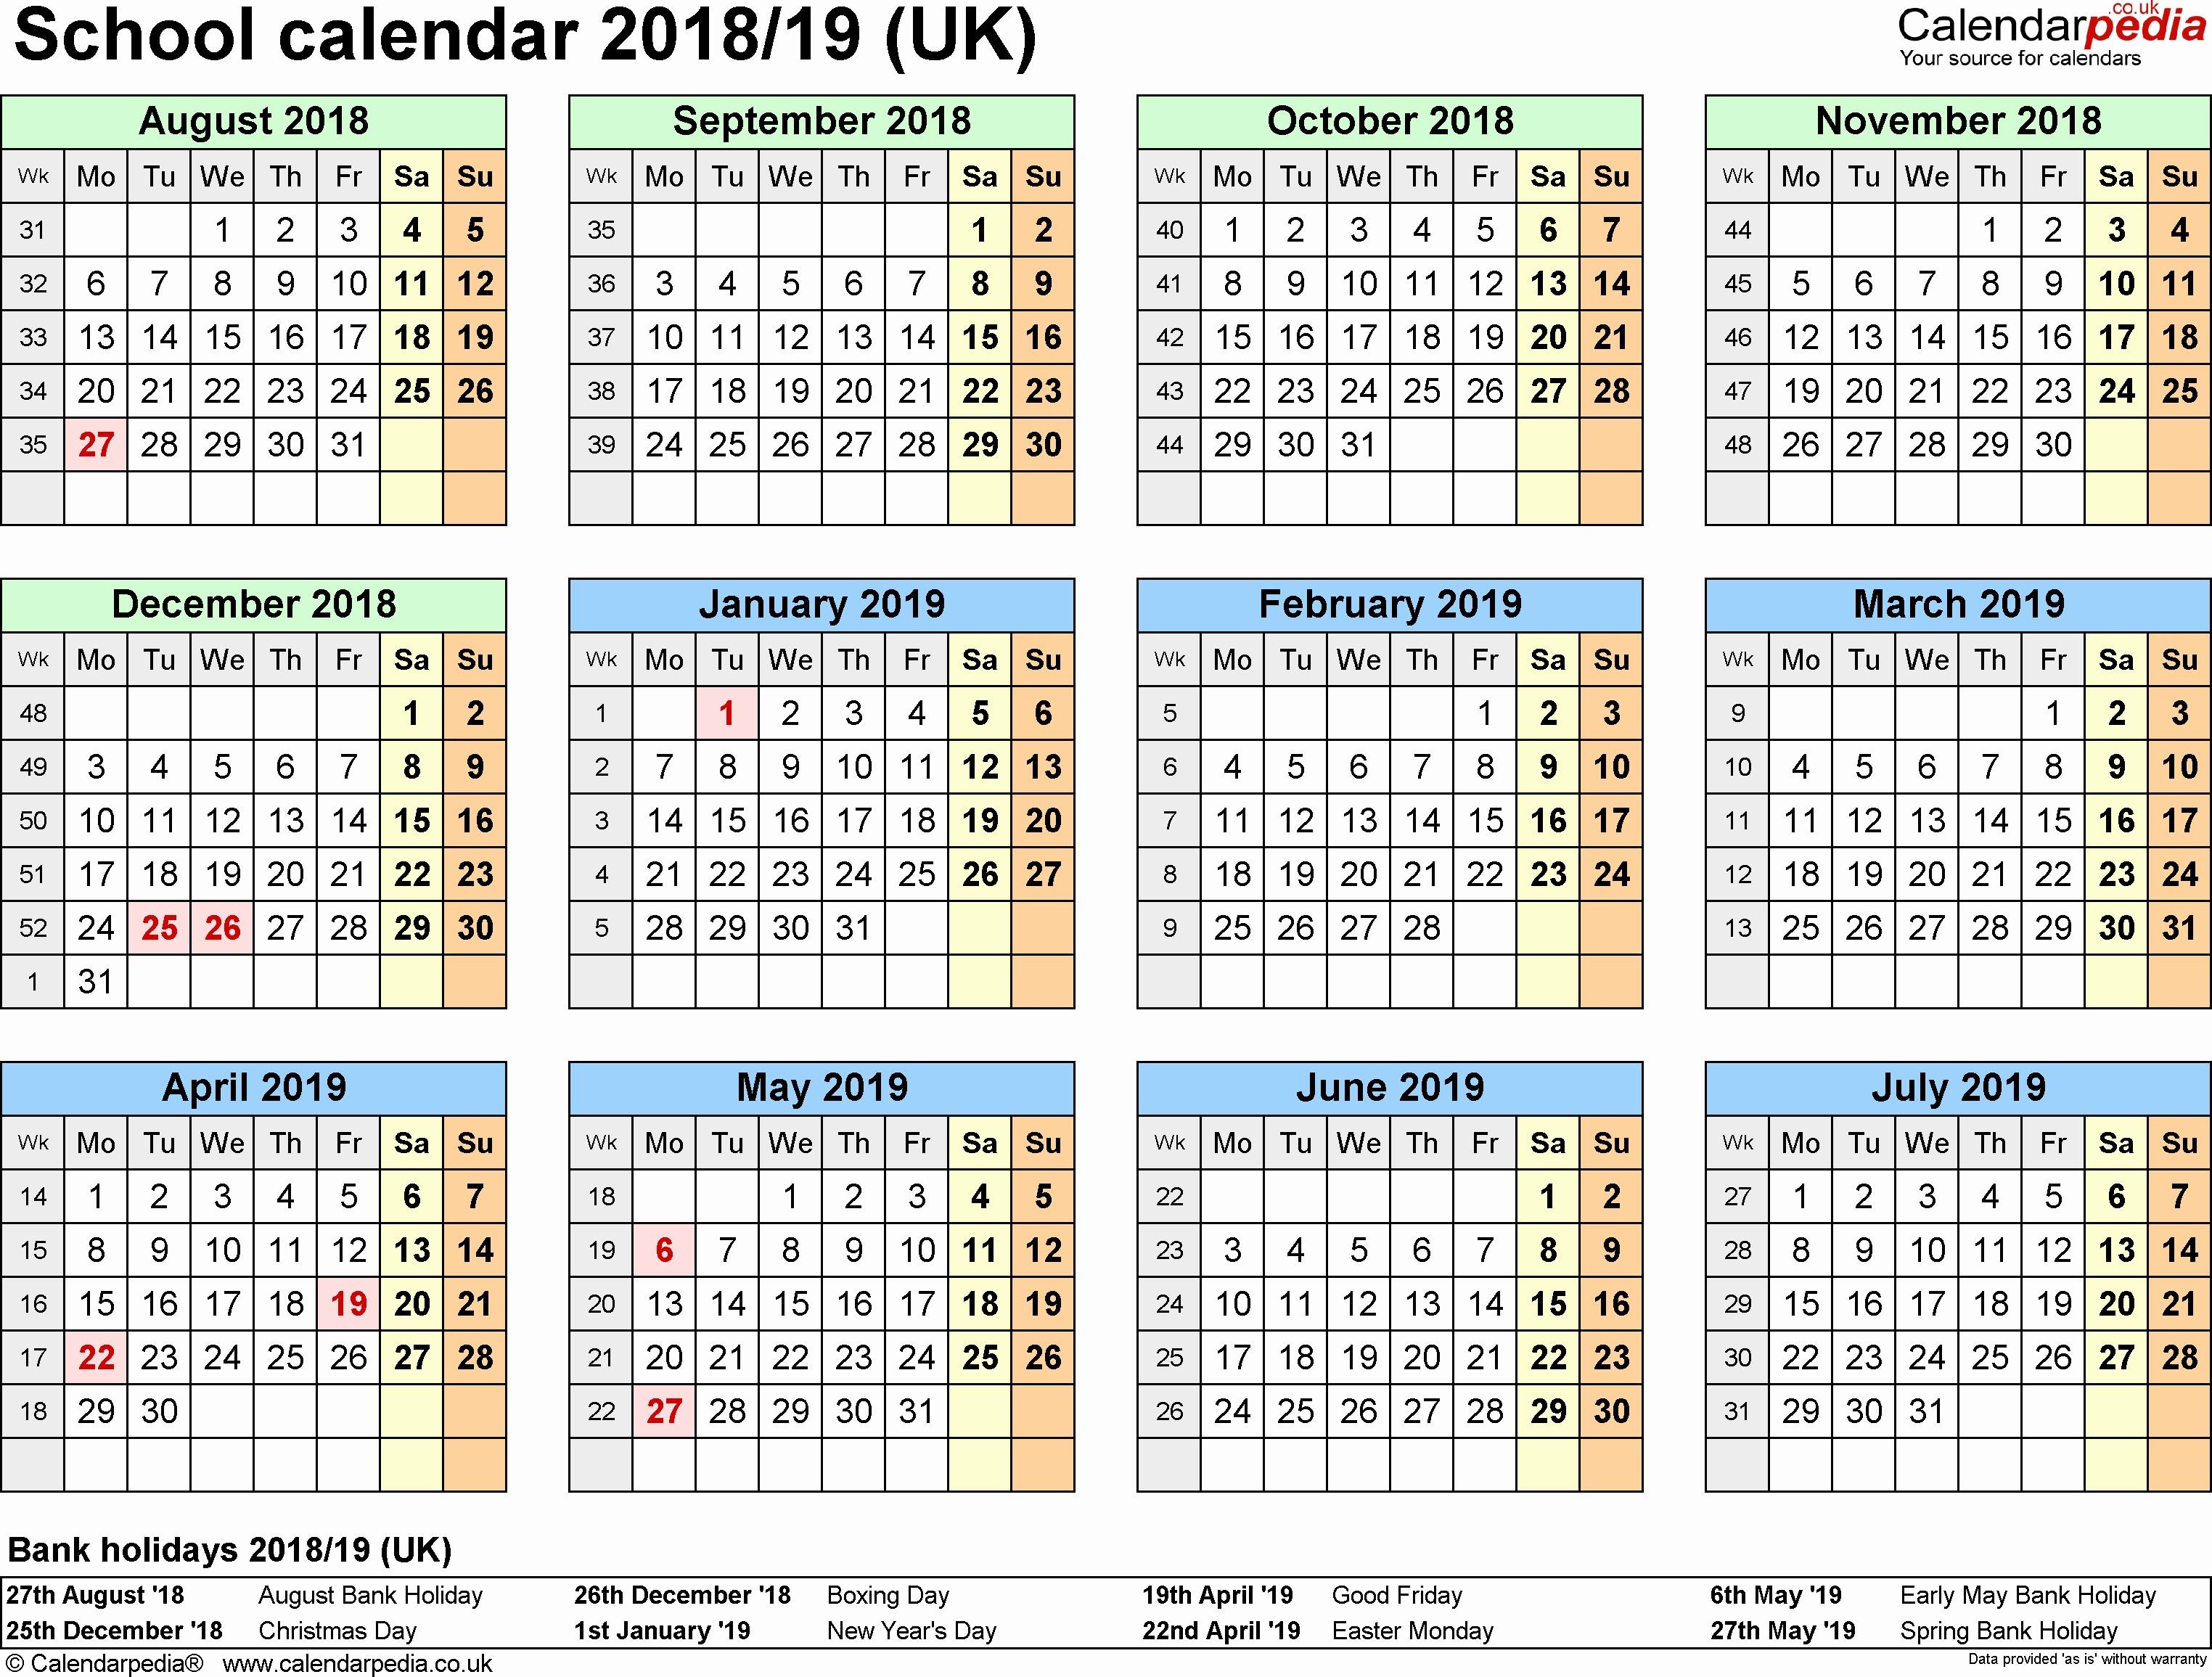 March Holiday Calendar 2019 Más Arriba-a-fecha Printable Calendar for 2018 2019 March 2019 Calendar with Holidays Of March Holiday Calendar 2019 Más Caliente Printable March 2019 Calendar Template Holidays Yes Calendars